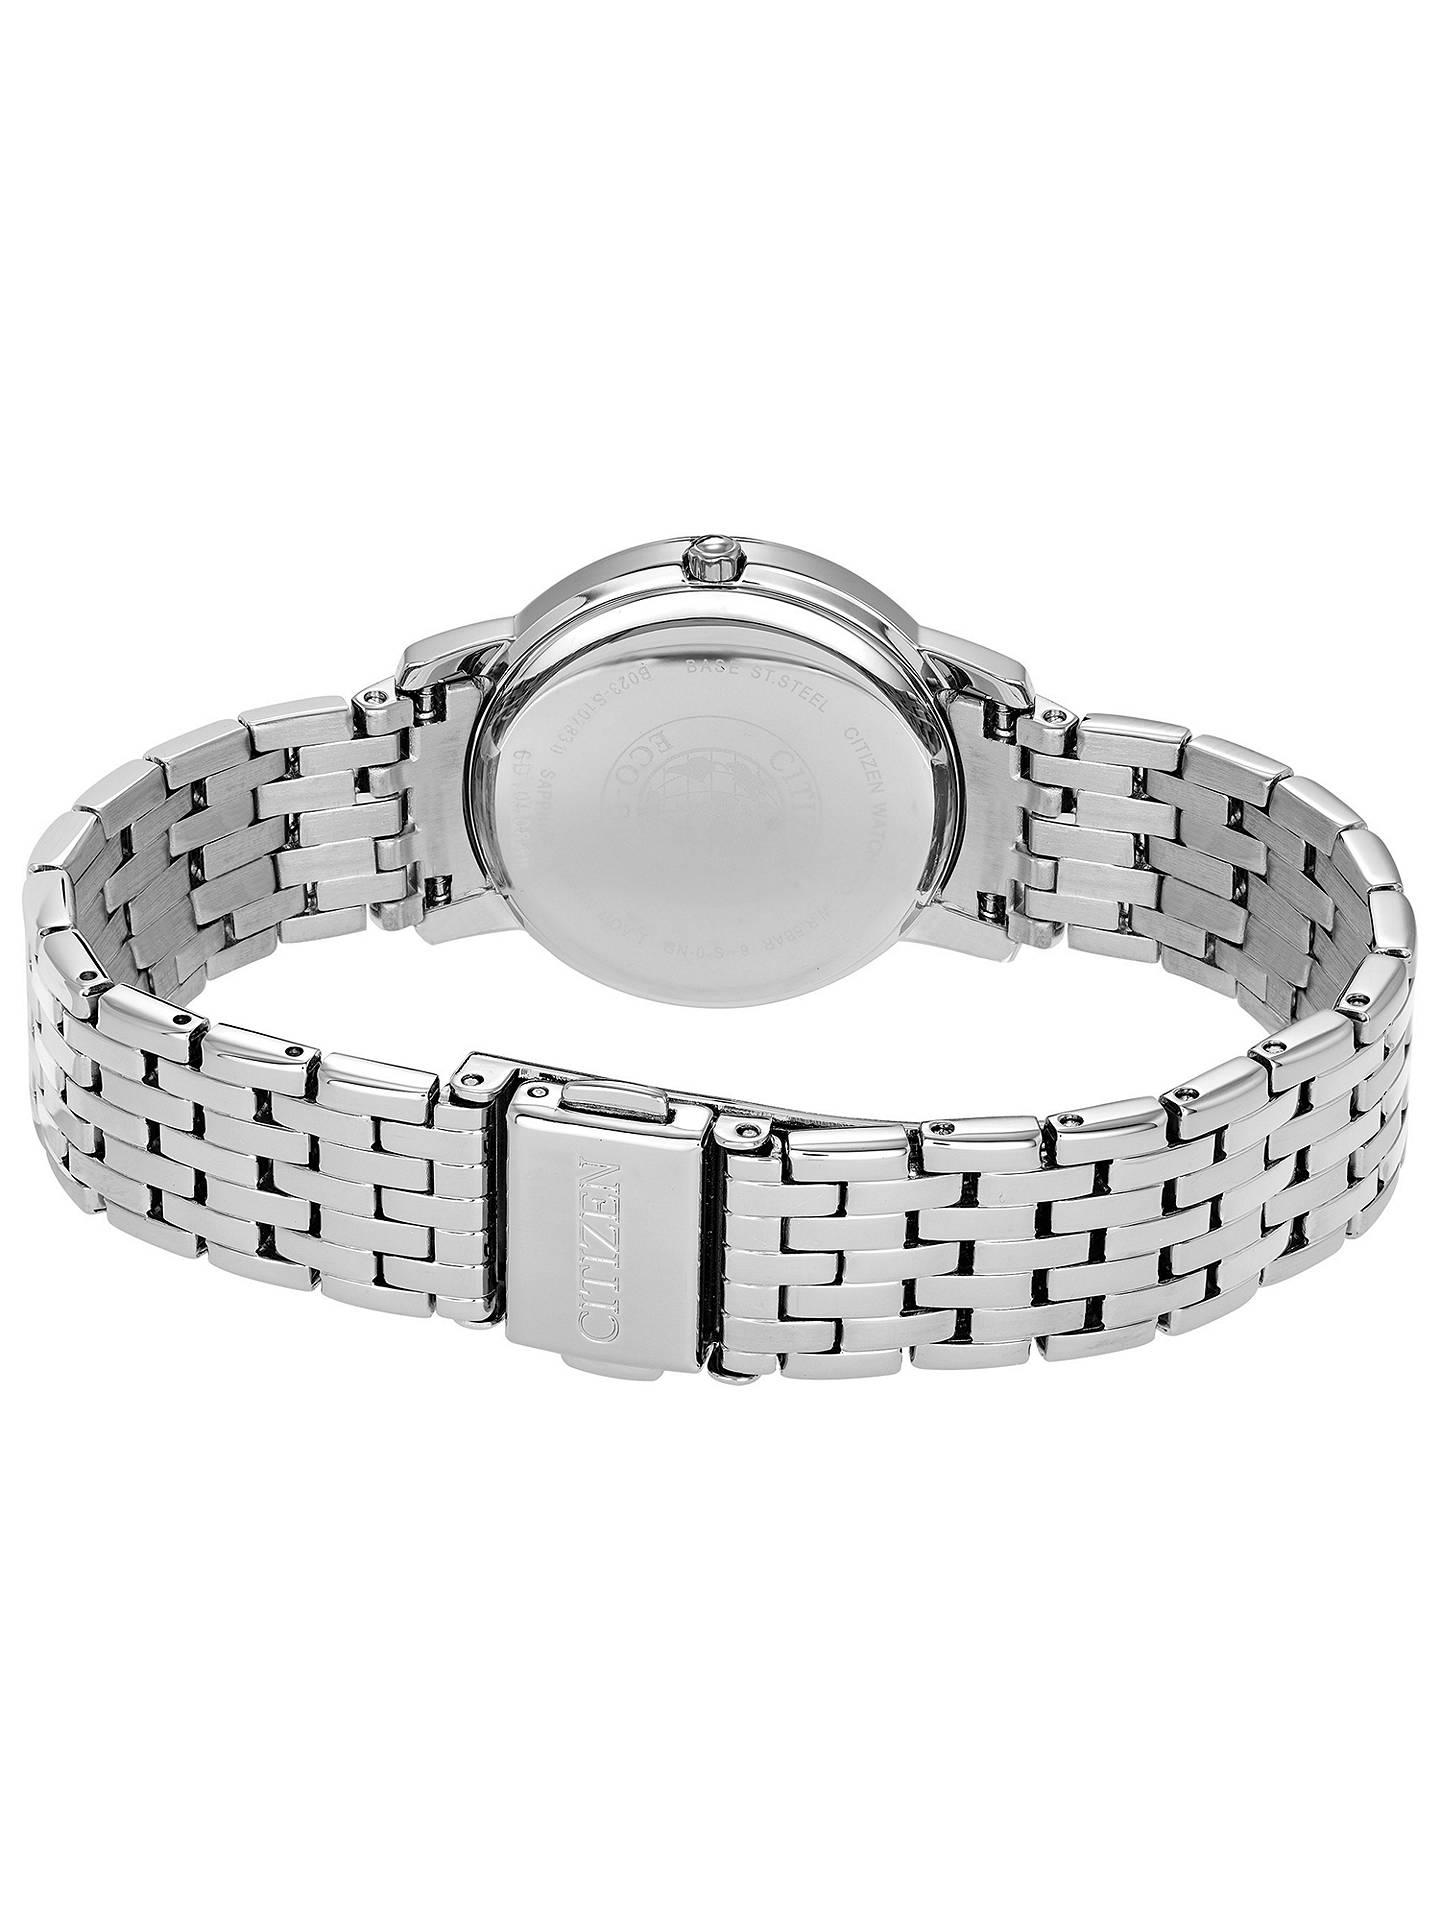 90fc3cdf63640 Citizen Women's Silhouette Swarovski Crystal Eco-Drive Bracelet ...